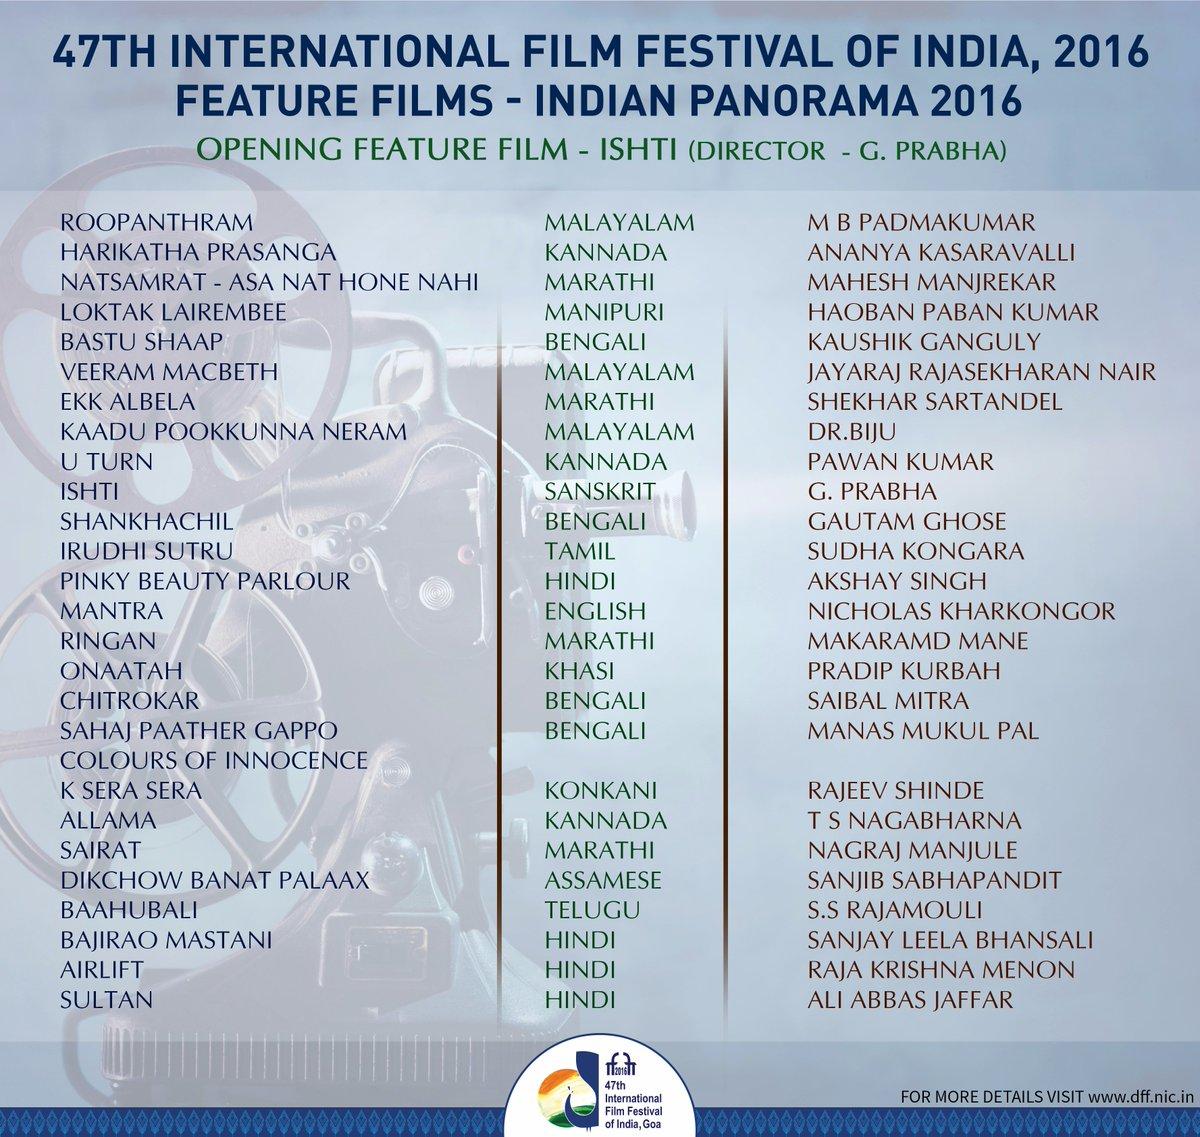 DFF India on Twitter: